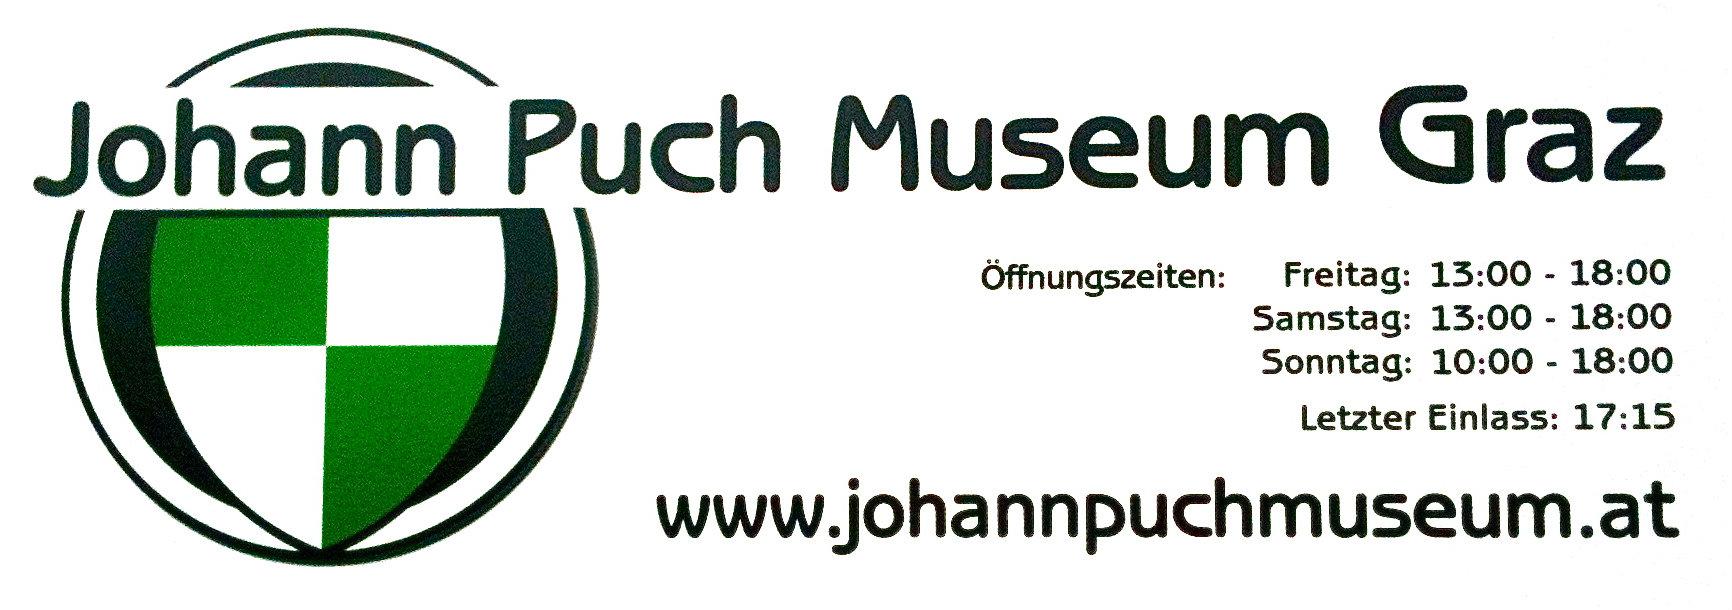 johanpuchmuseum.jpg